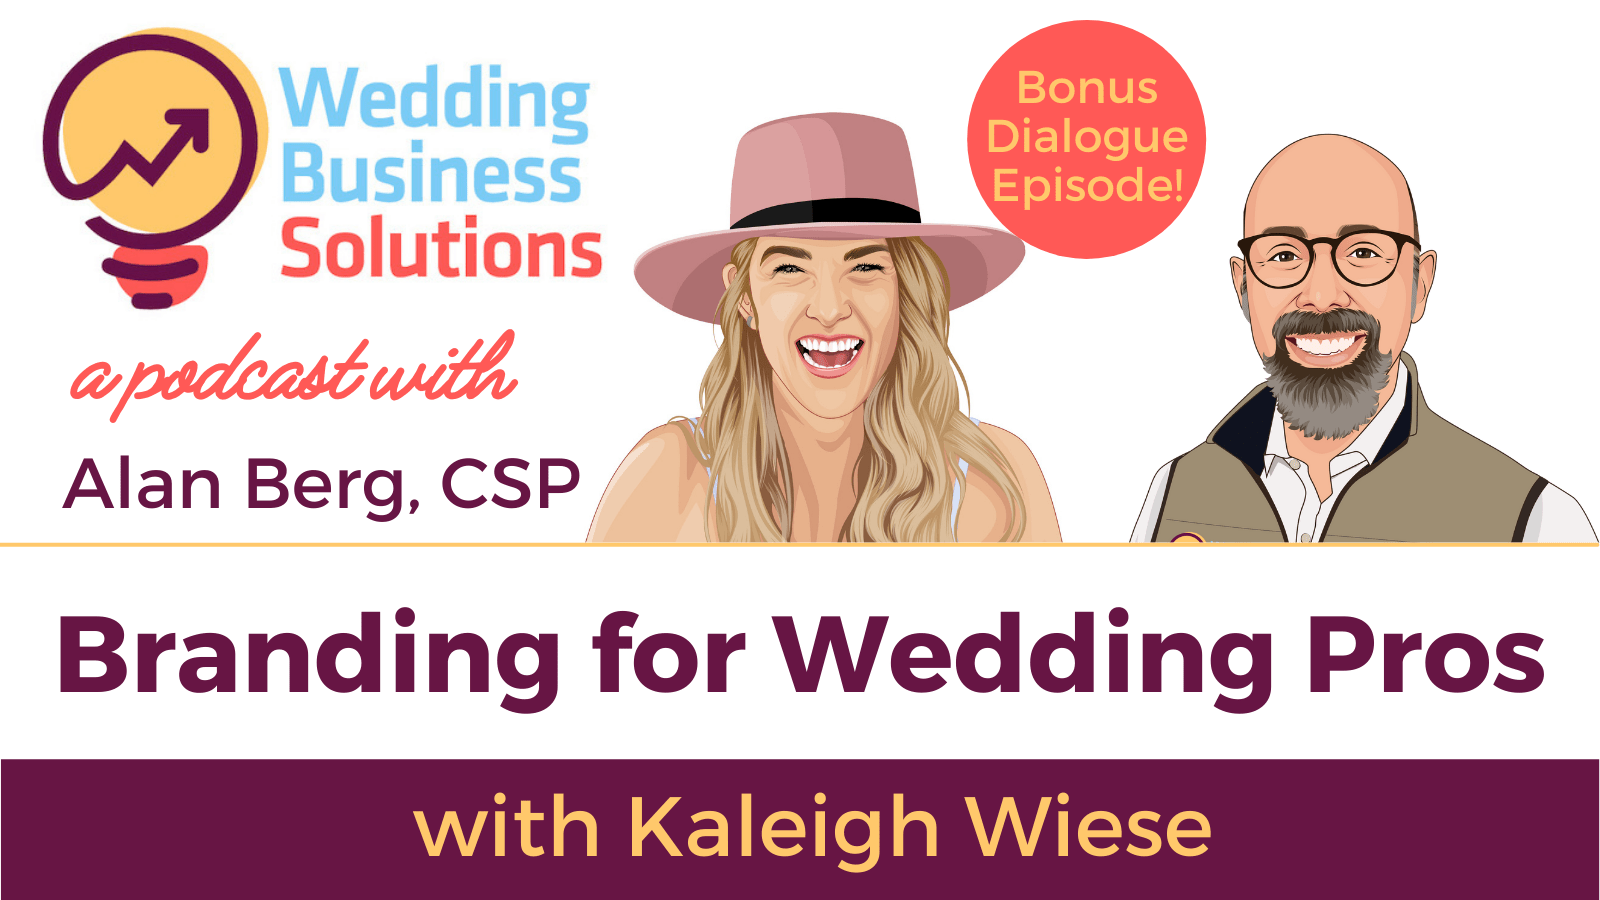 Kaleigh Wiese – Branding for Wedding Pros – Bonus Dialogue Episode